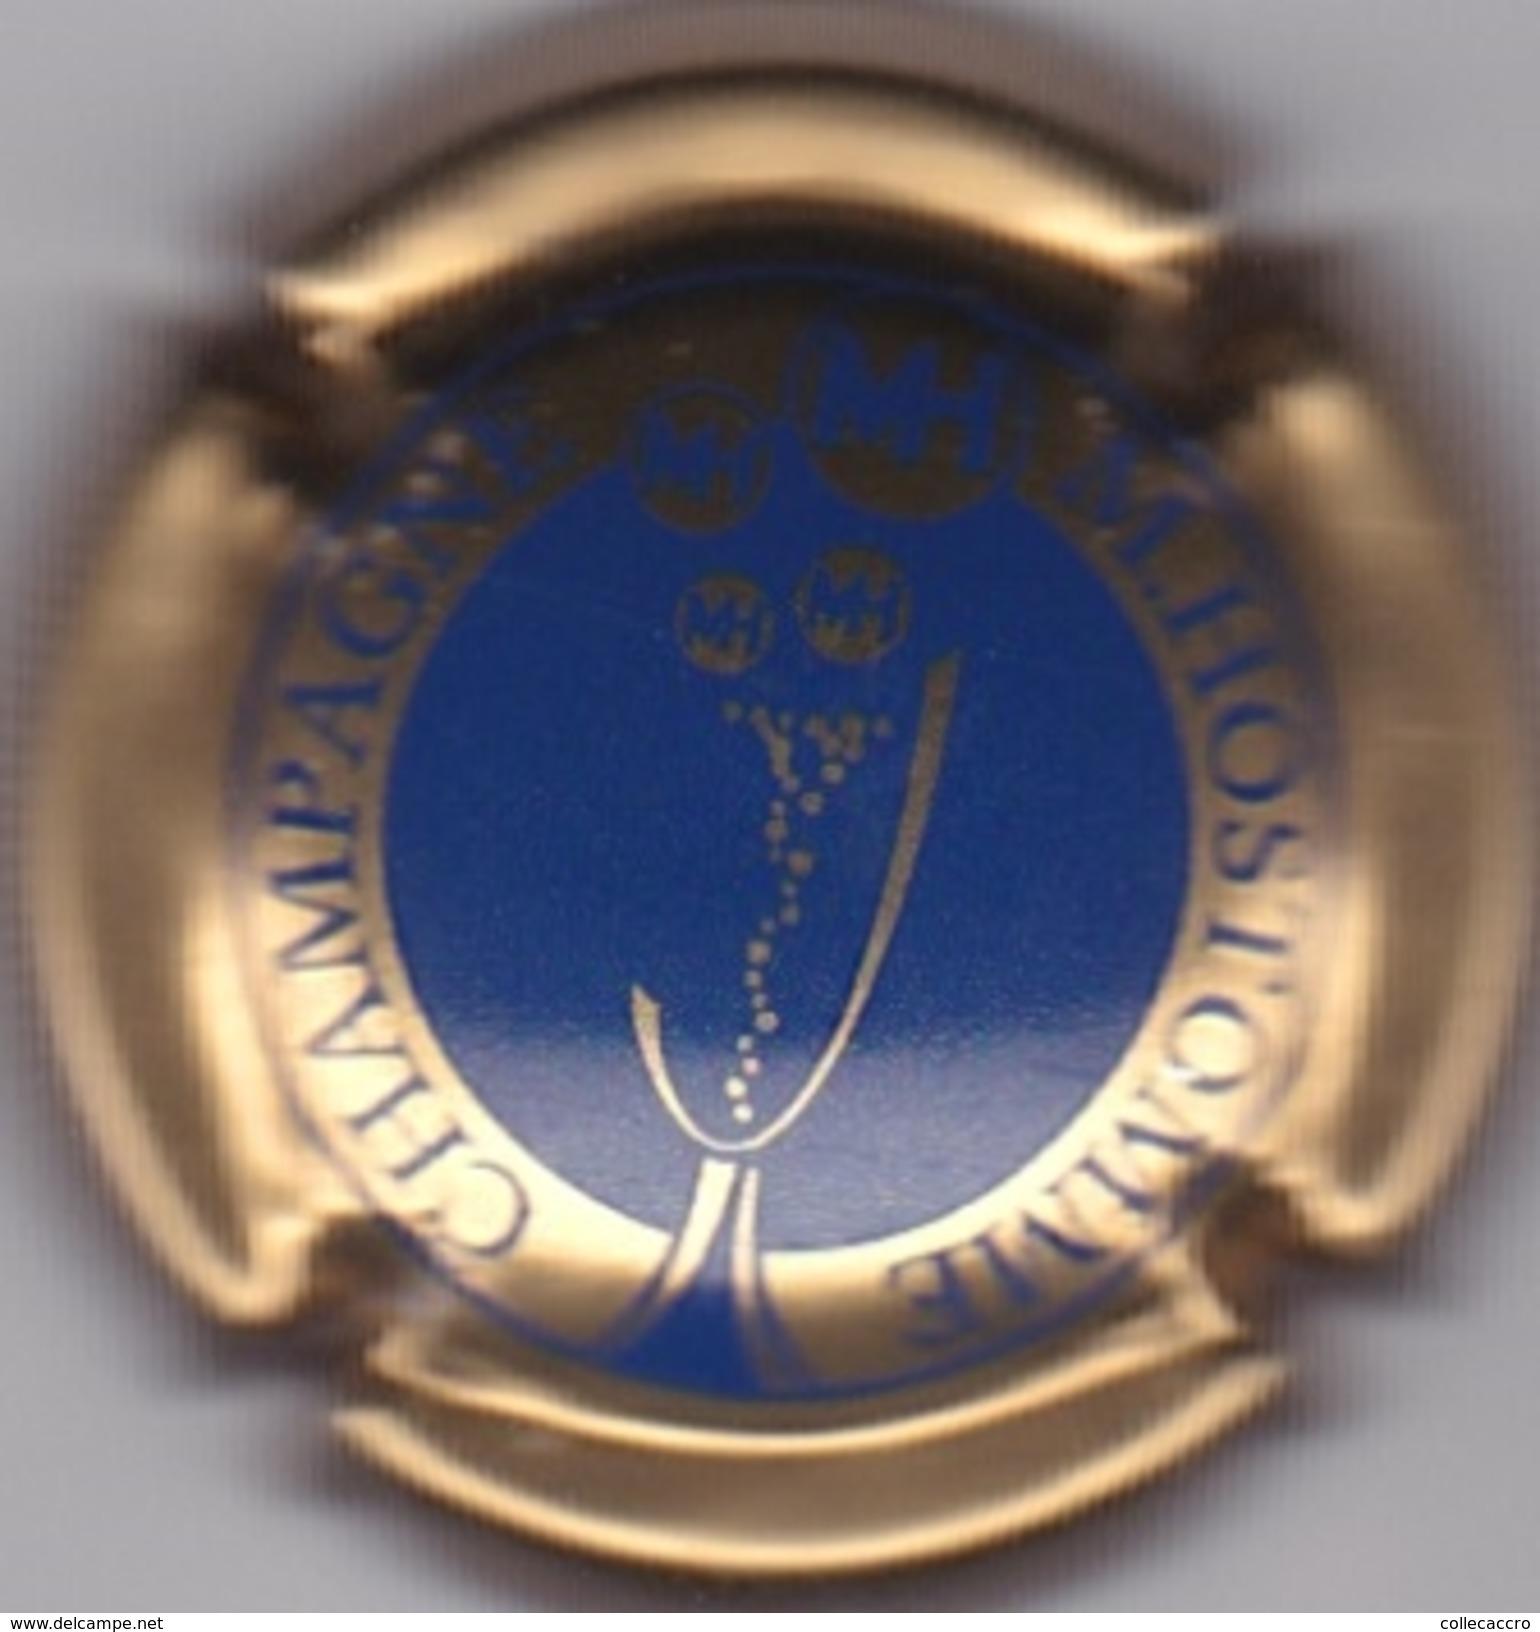 HOSTOMME N°30 - Champagne